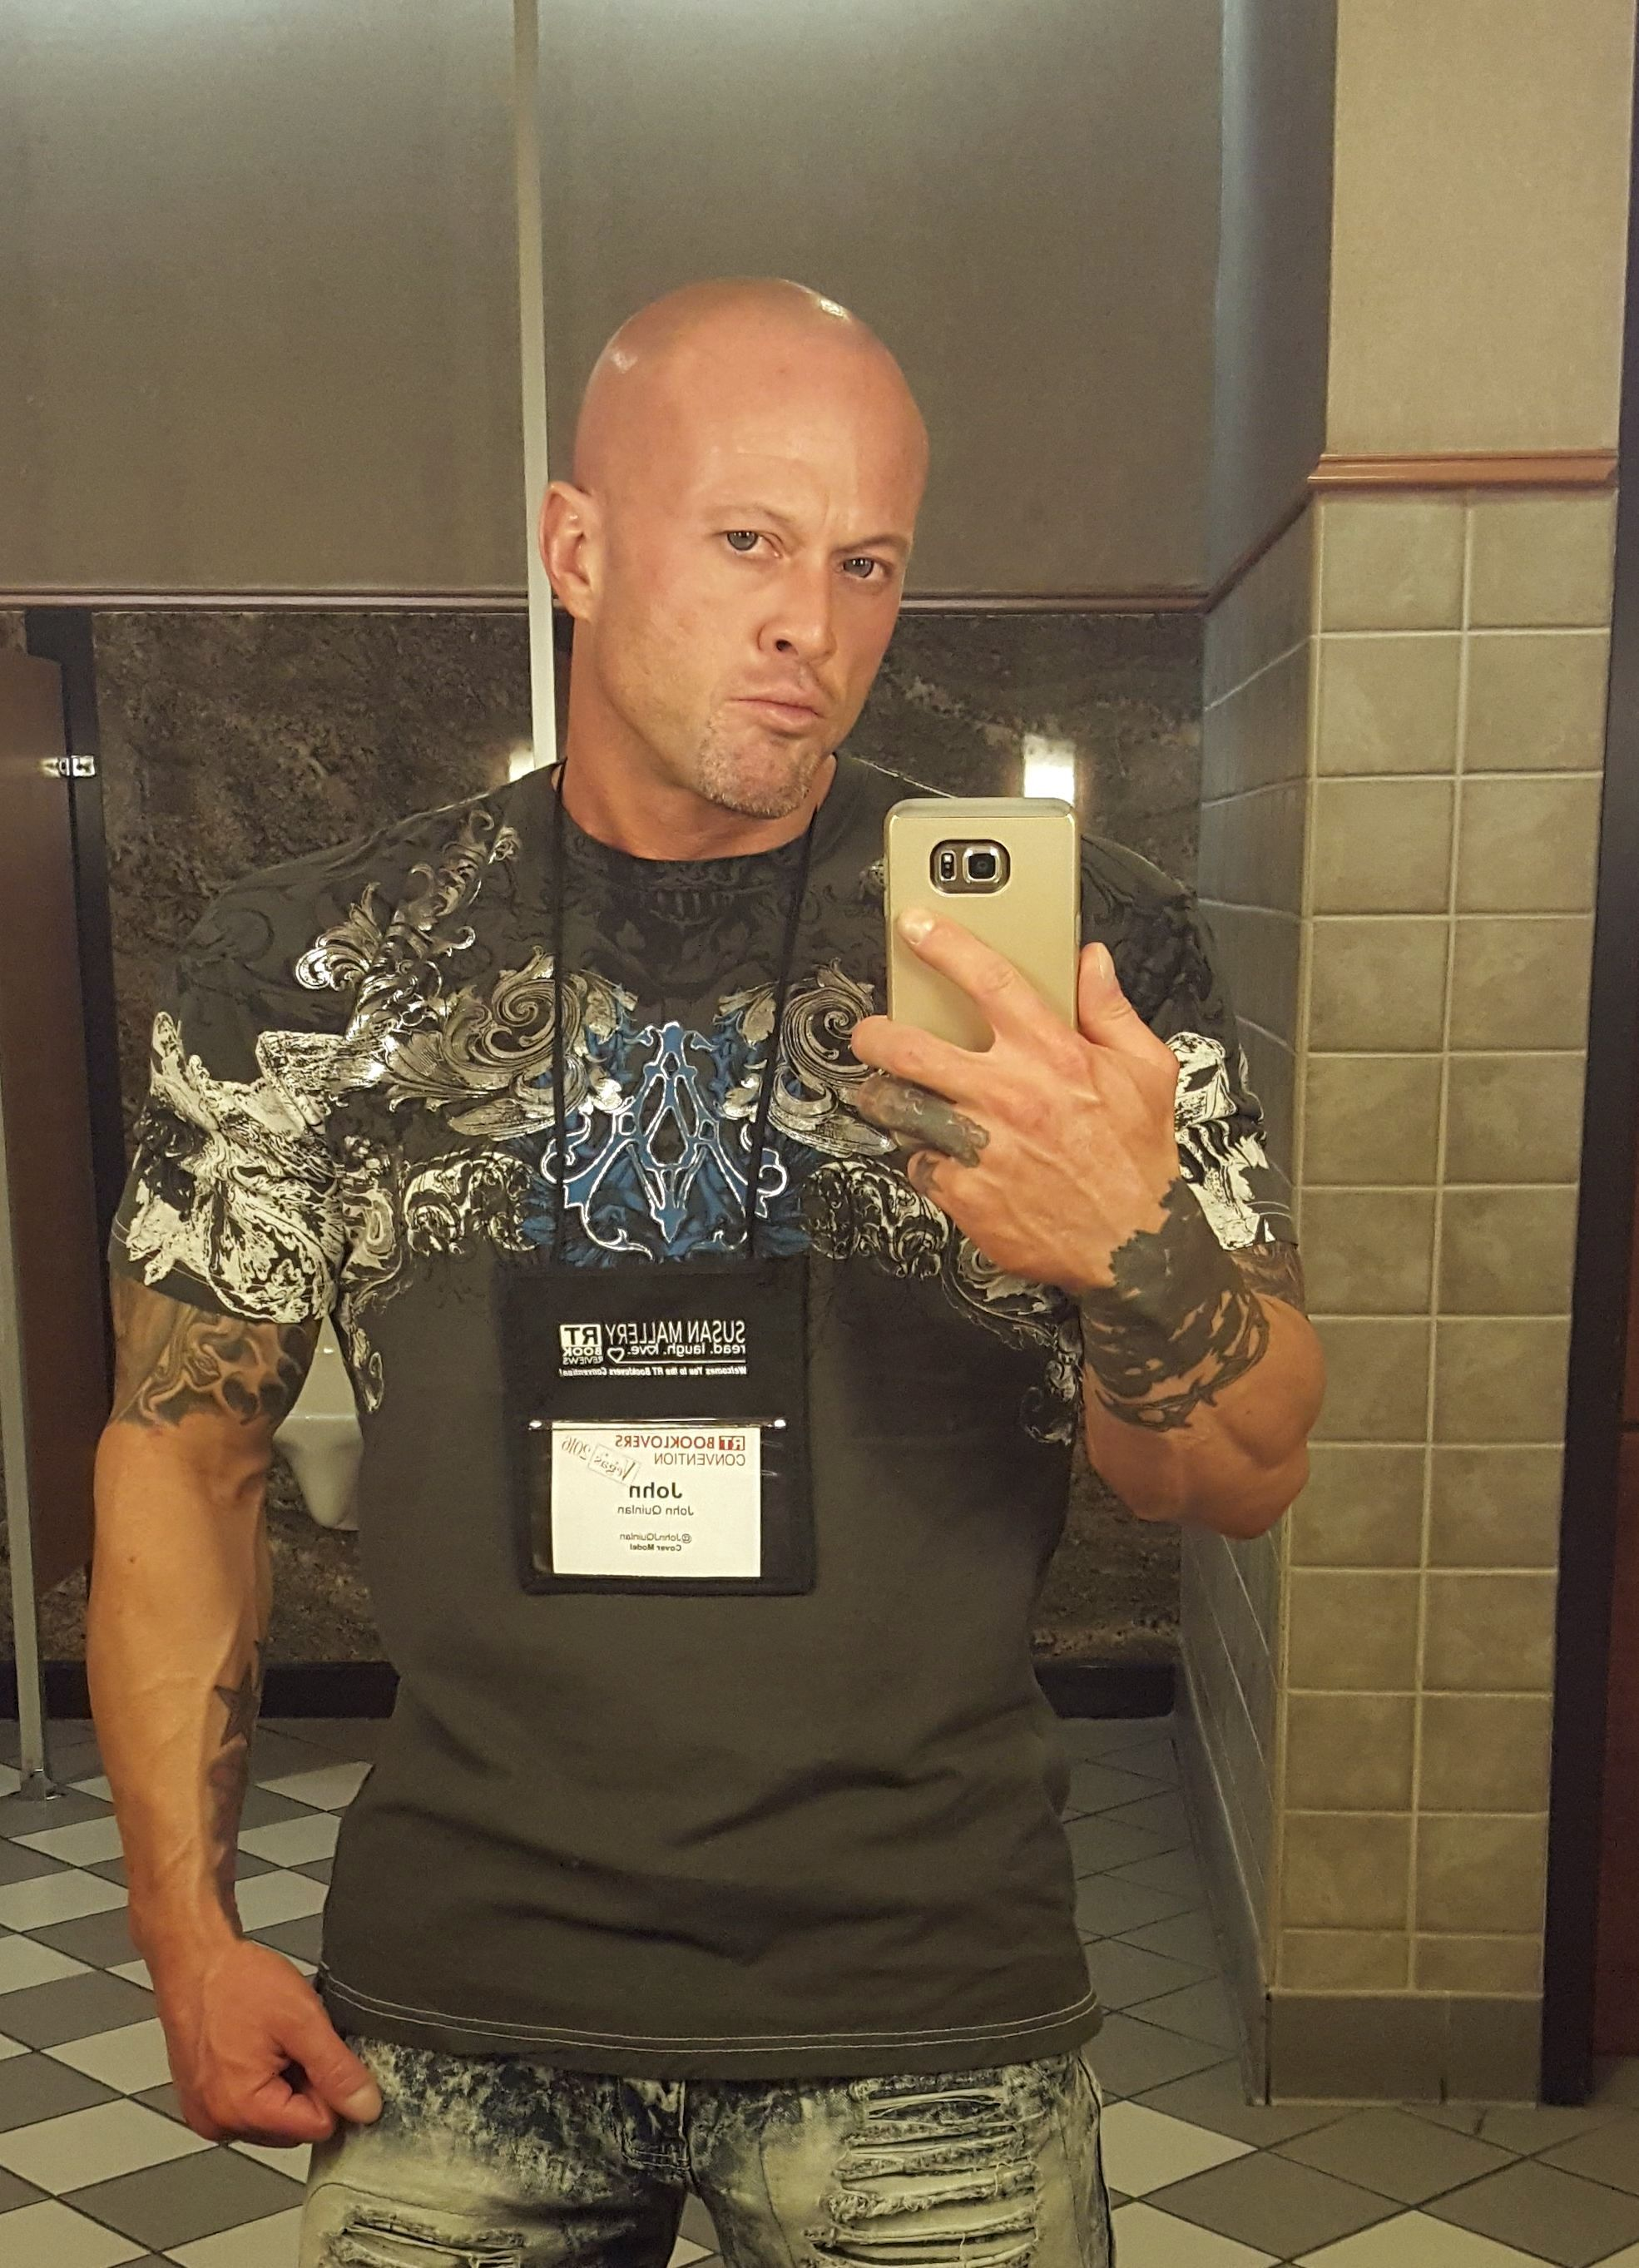 2016 RT Las Vegas Featured Cover Model & Actor John Joseph Quinlan. #JohnQuinlan